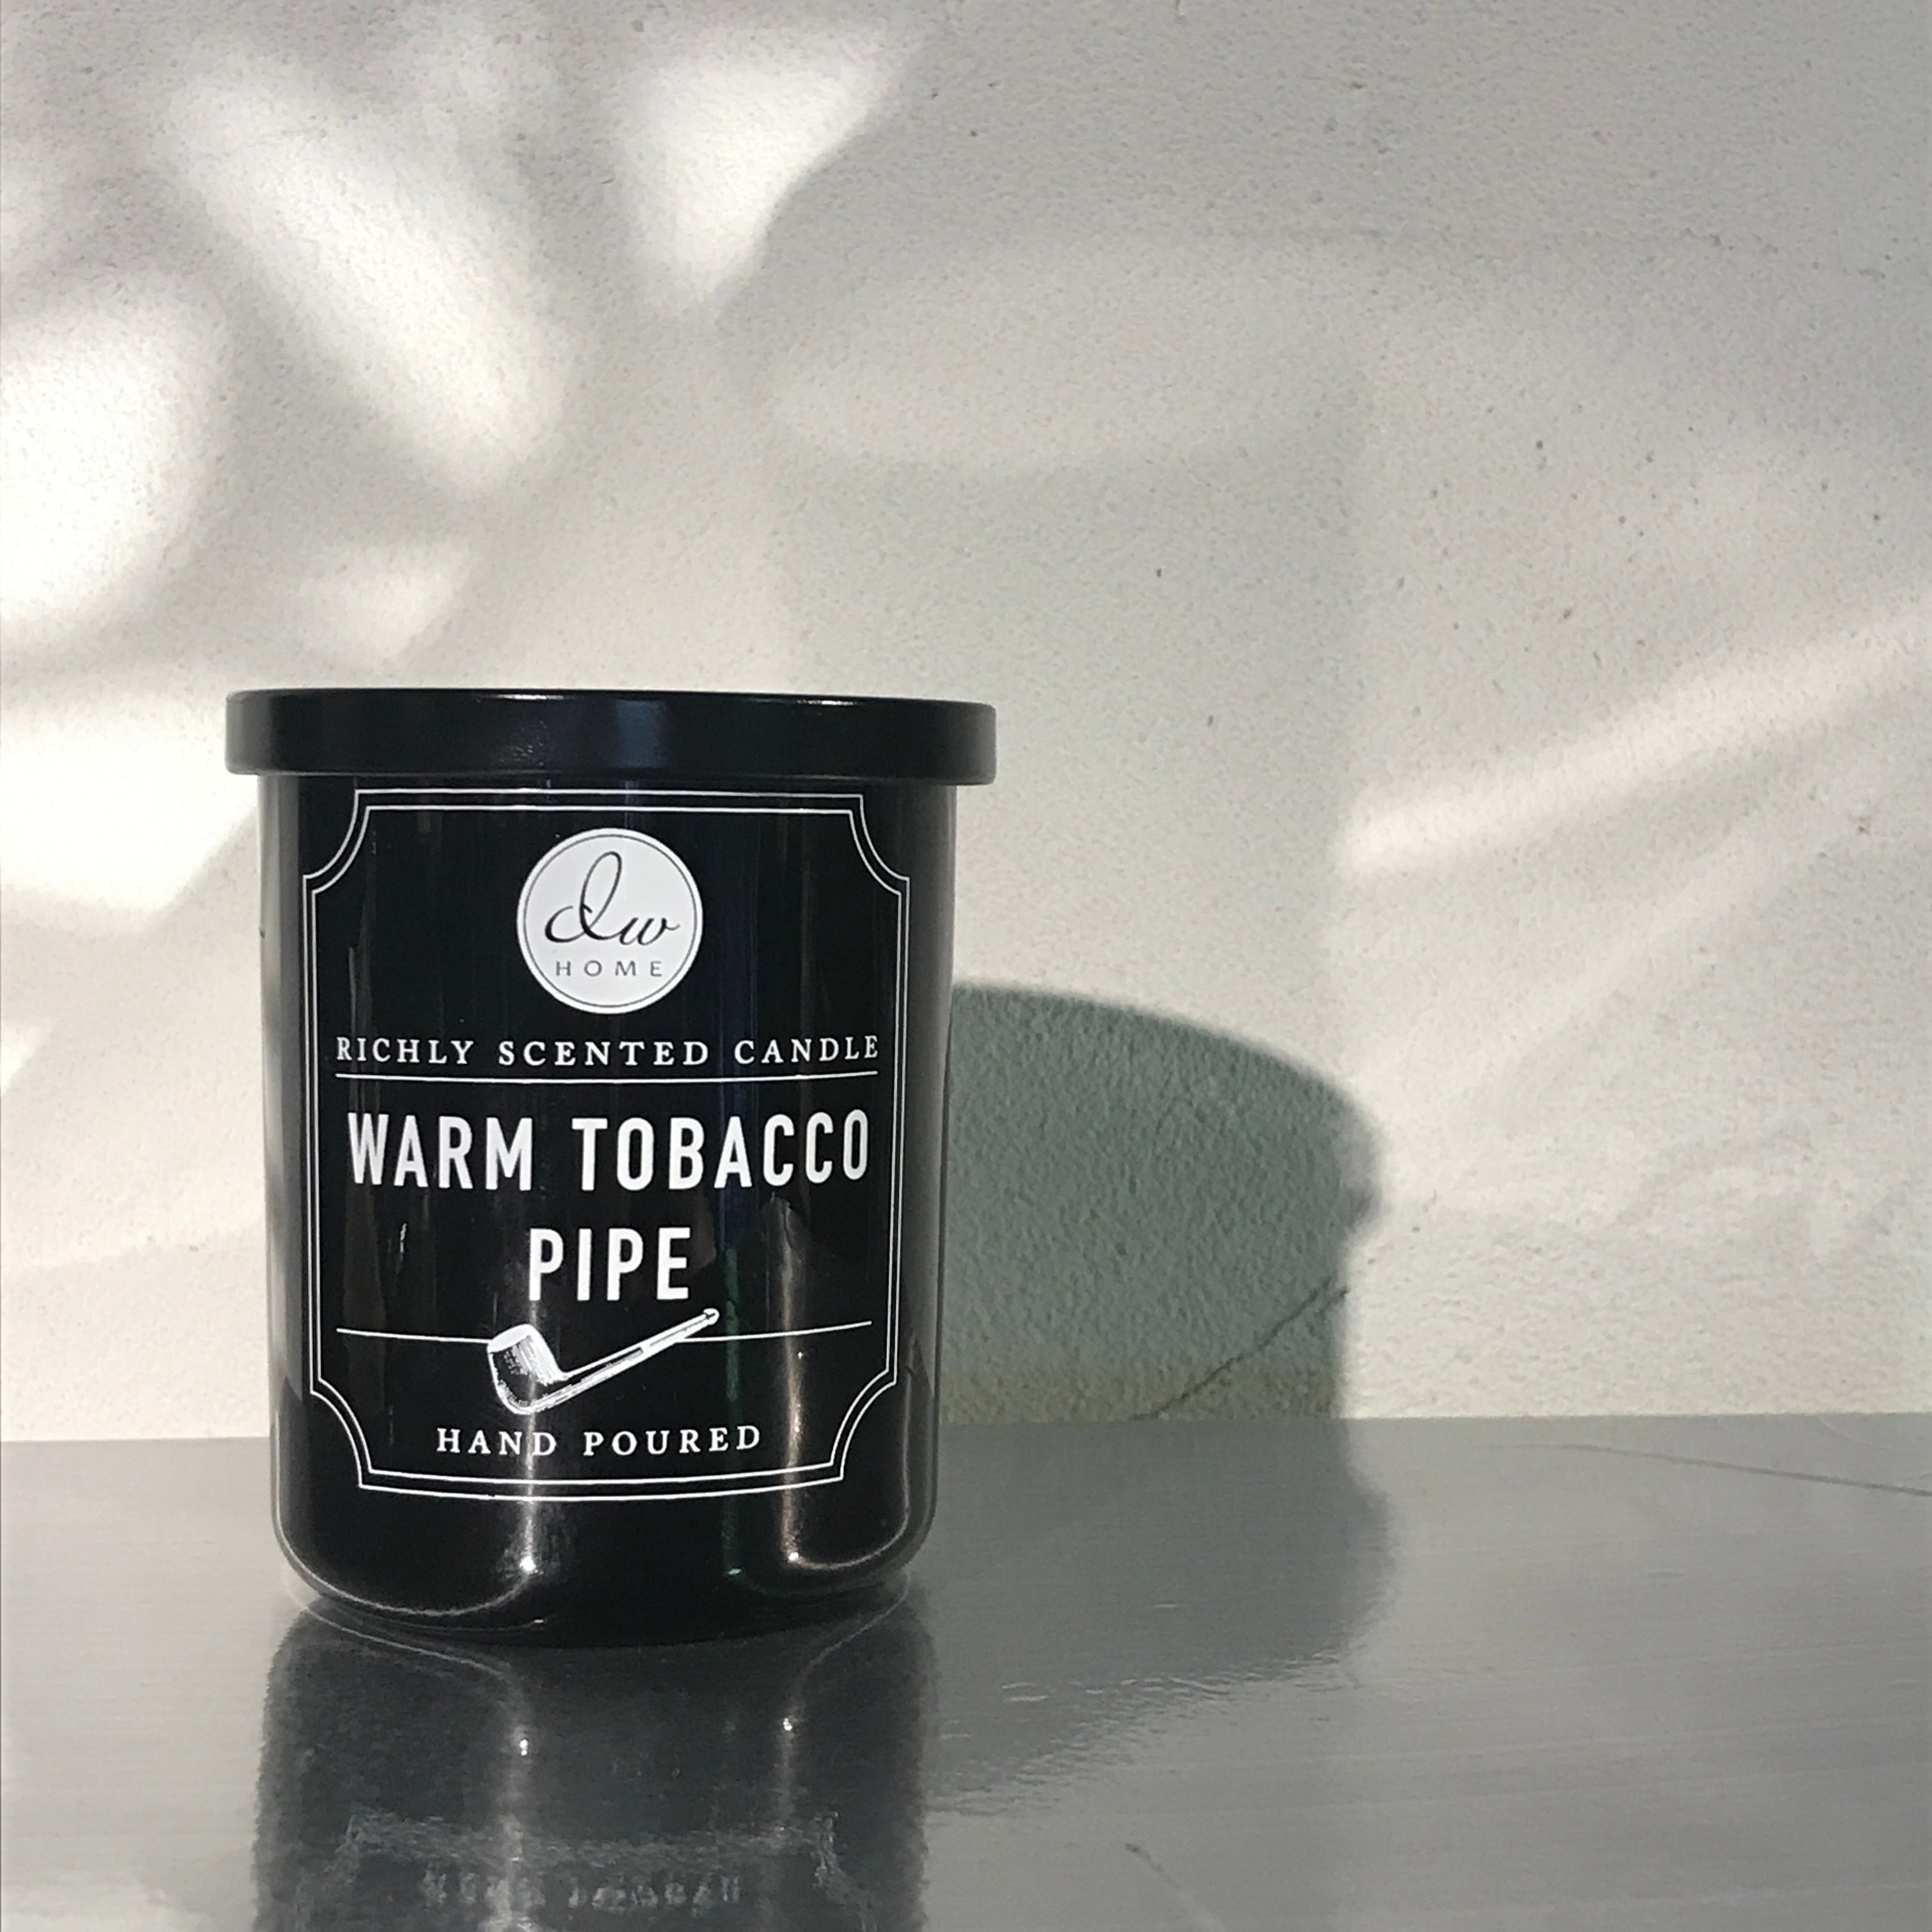 【Dw Home Candles】WARM TABACCO PIPE【アロマキャンドル】